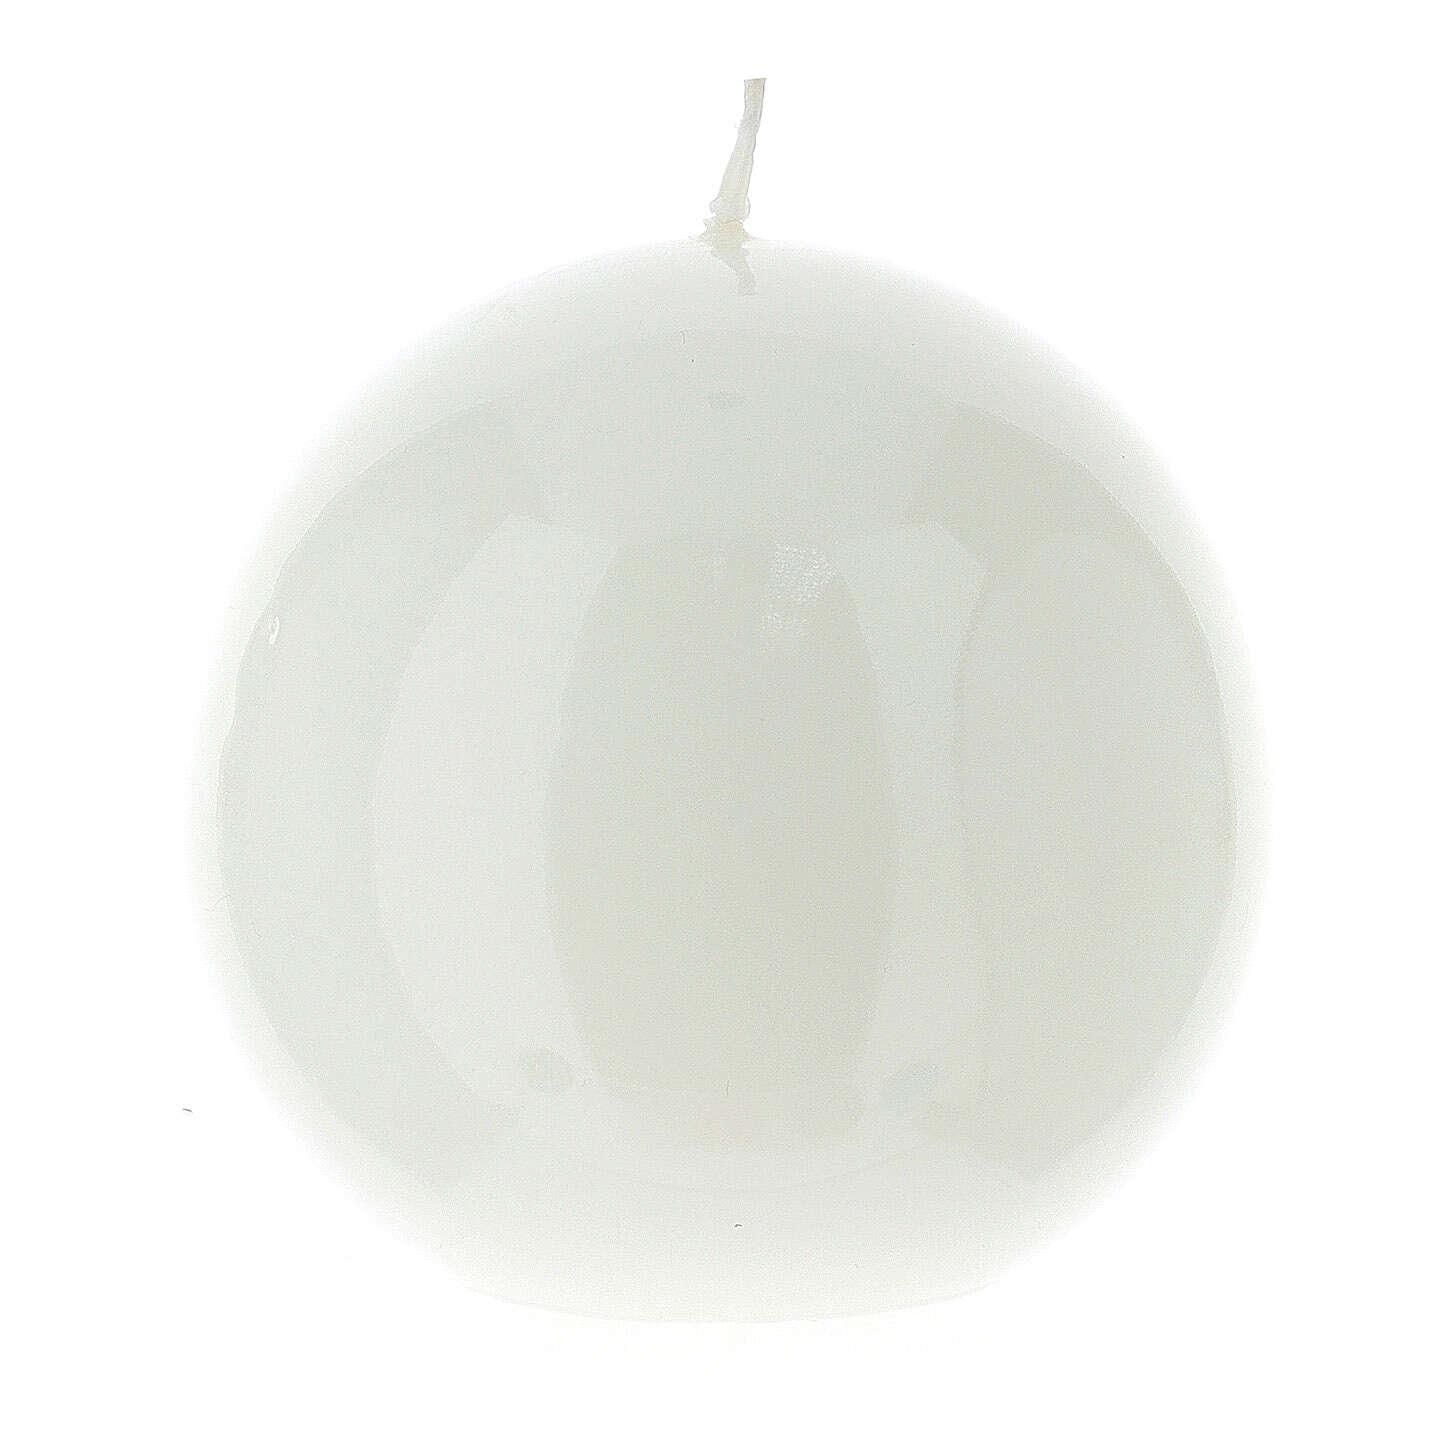 Altarkerze glänzend 10 cm kugelförmig 3